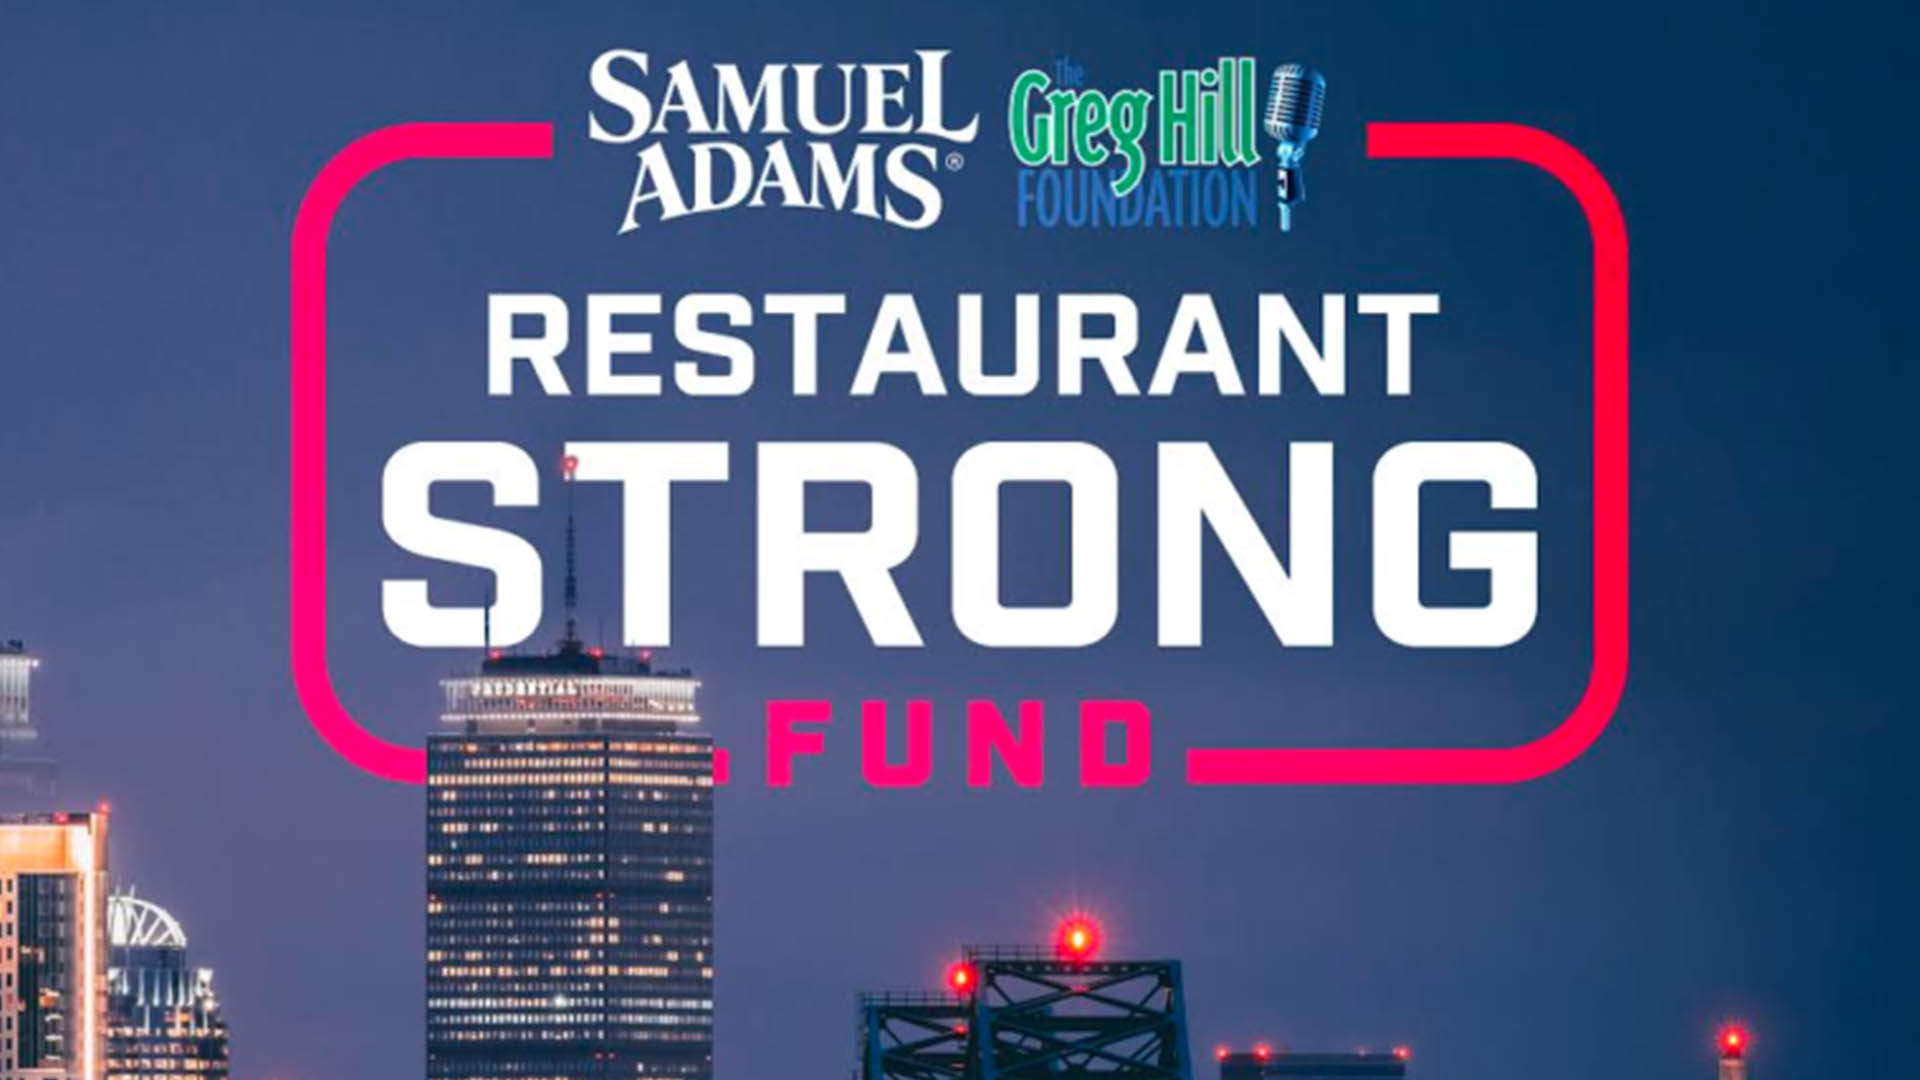 Sam Adams Restaurant Strong